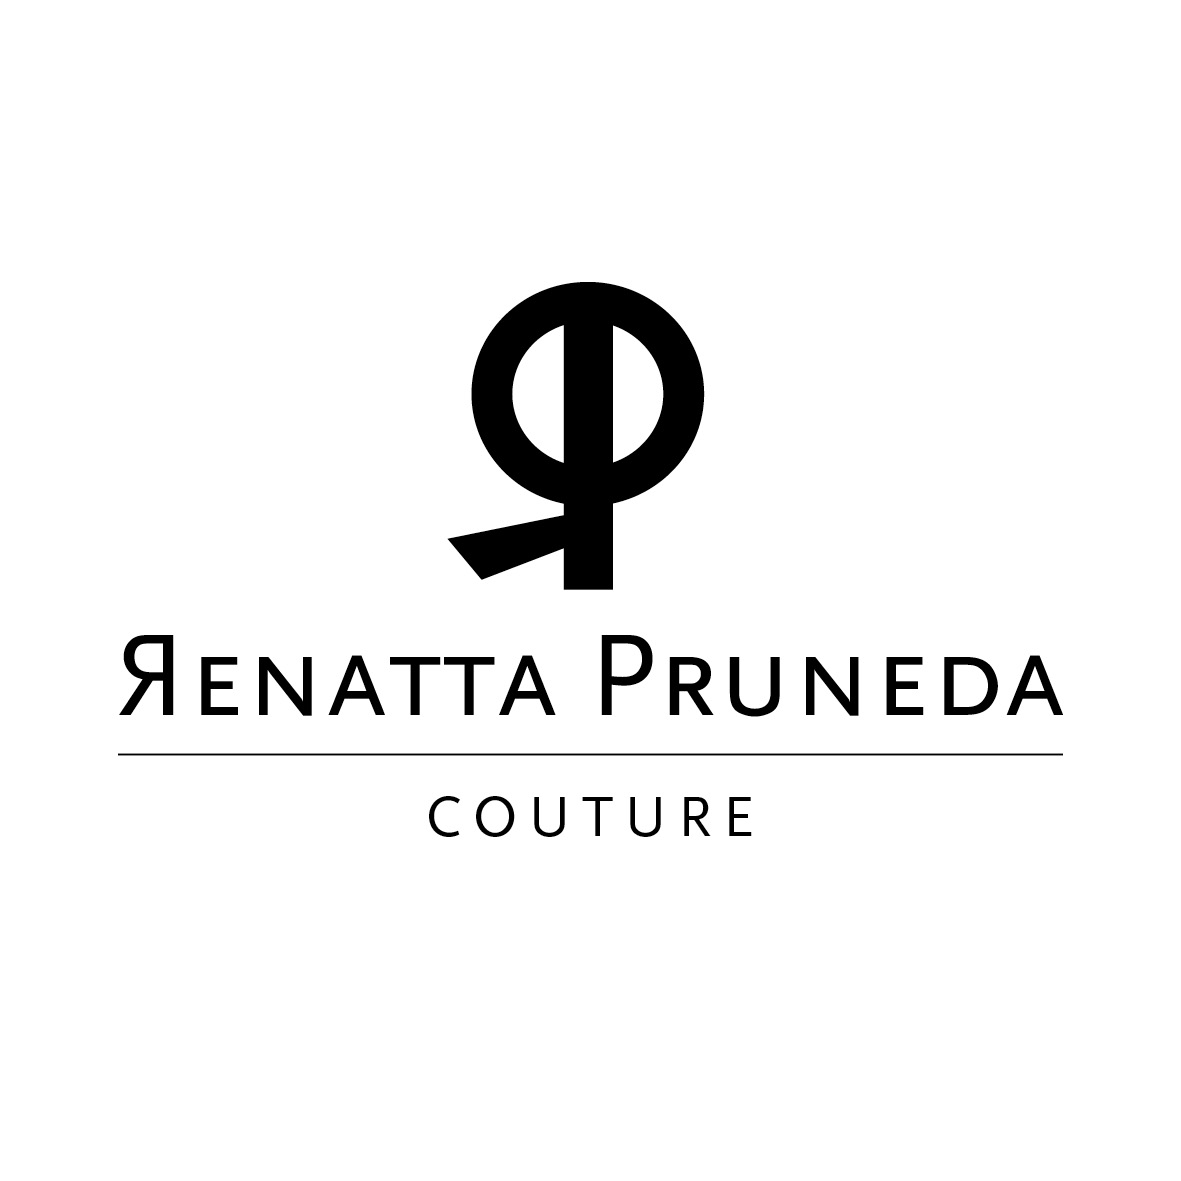 RENATTA PRUNEDA